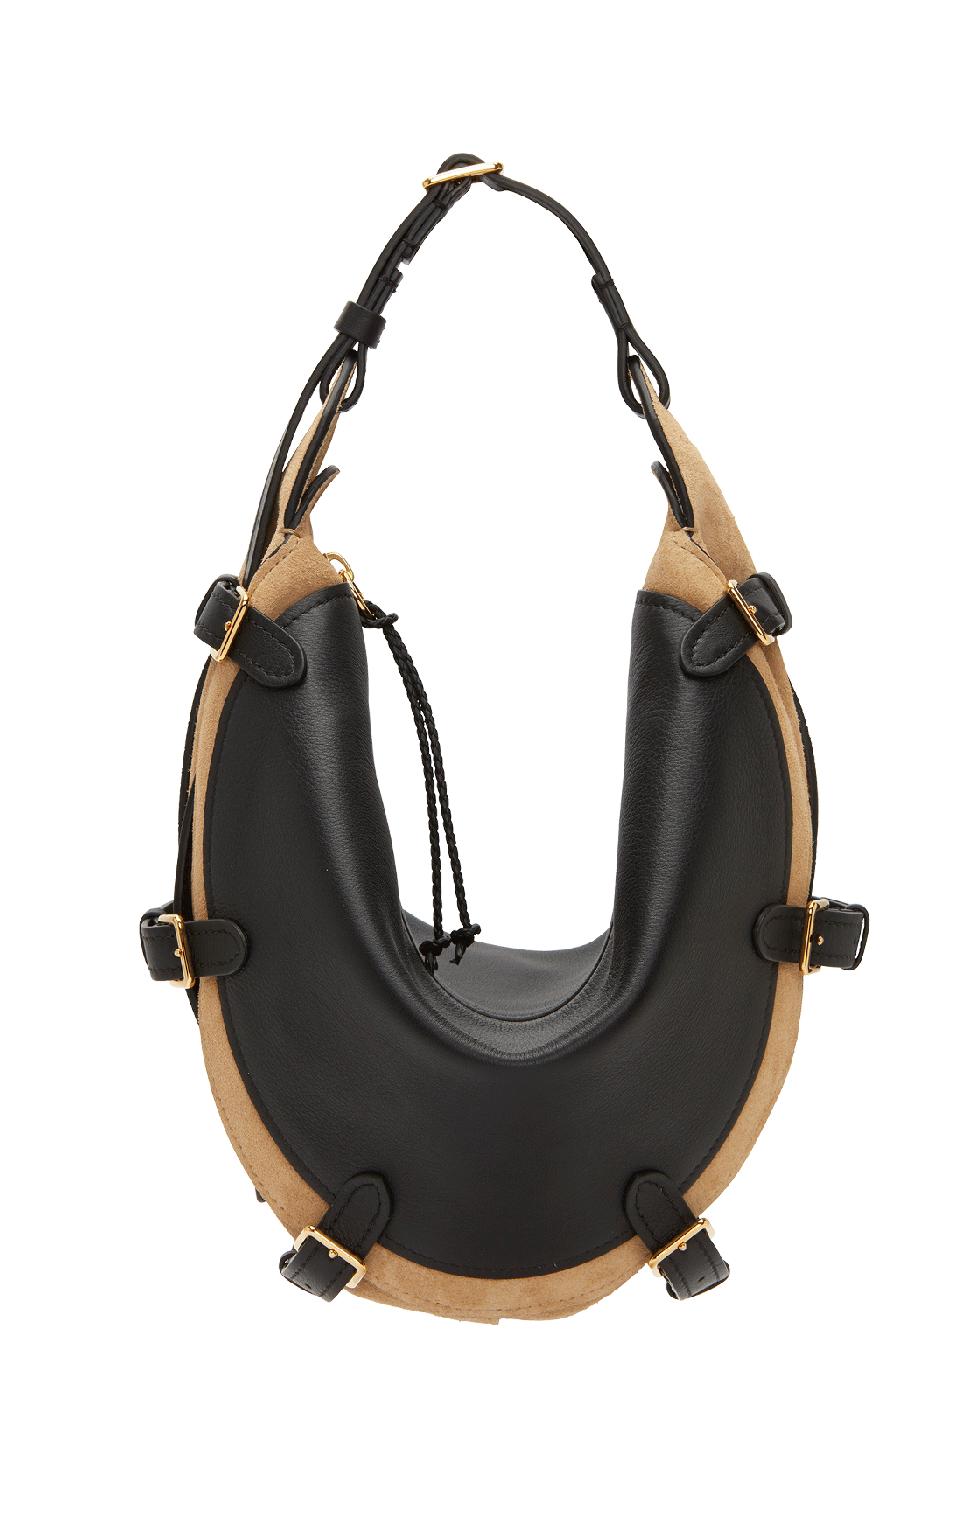 Altuzarra'PLAY' bag, $2,195